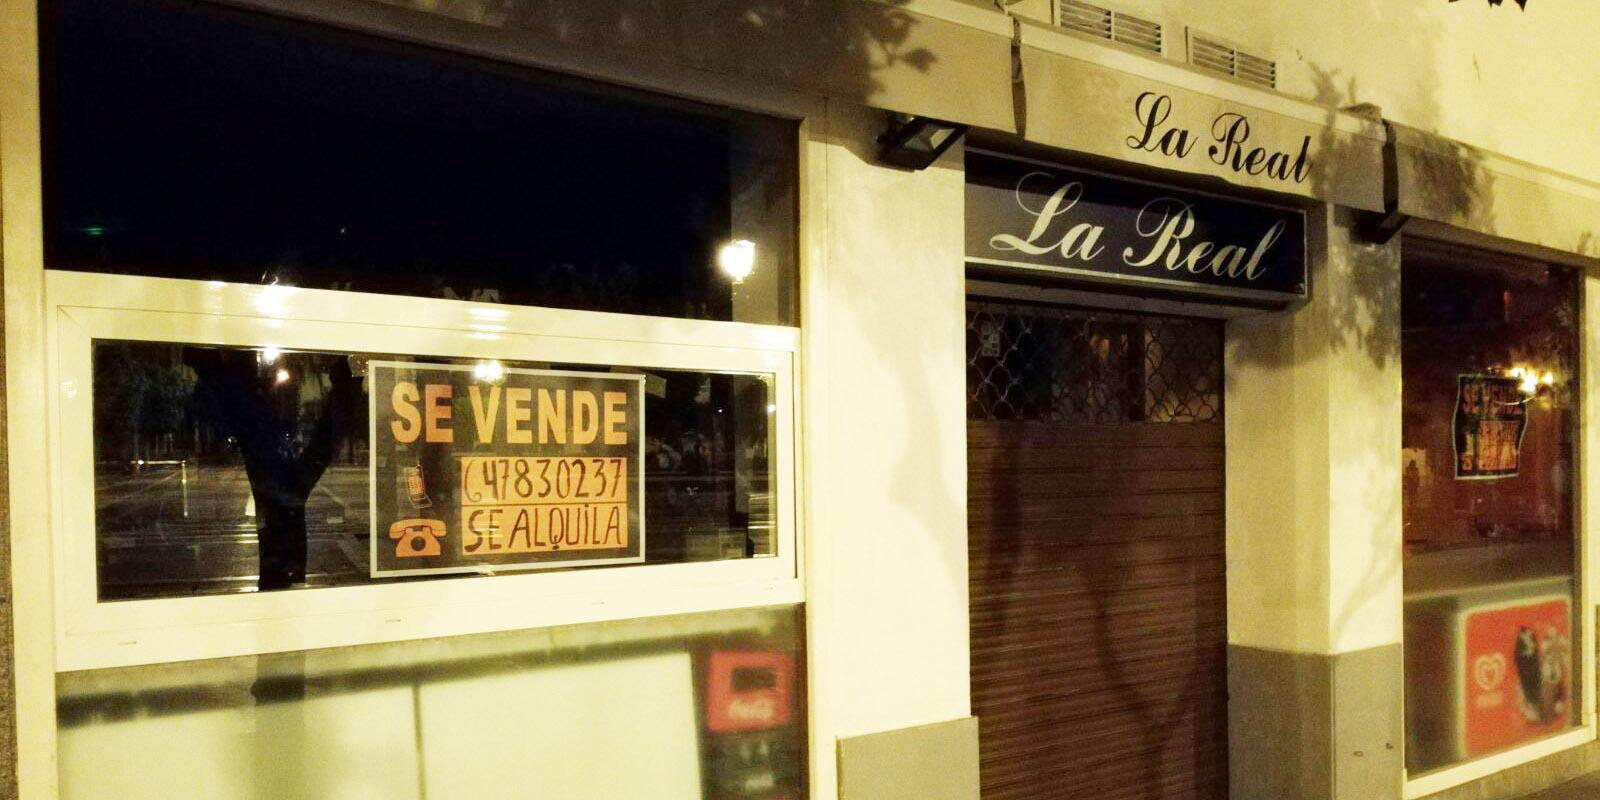 Cierra definitivamente la cervecer a la real de la plaza del arenal el mira - Farmacia guardia puerto del rosario ...